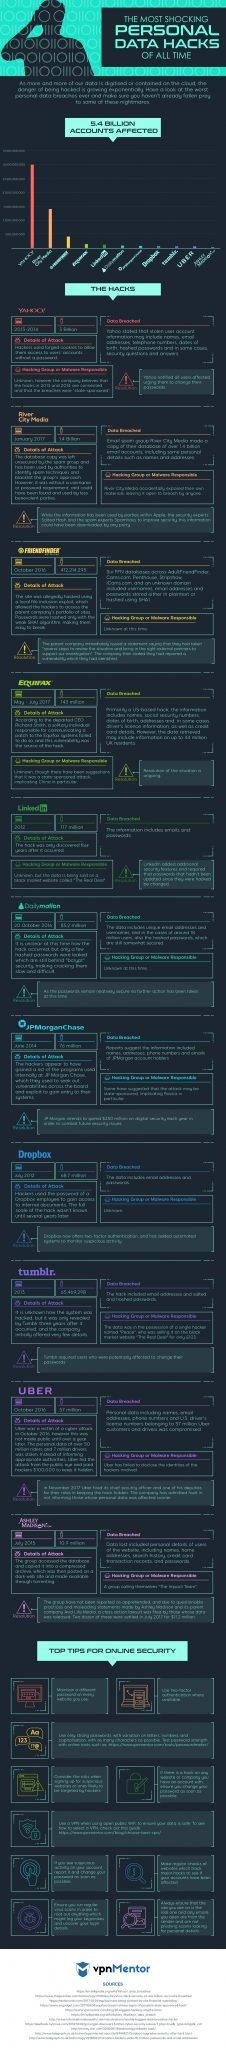 Infographic data hacks